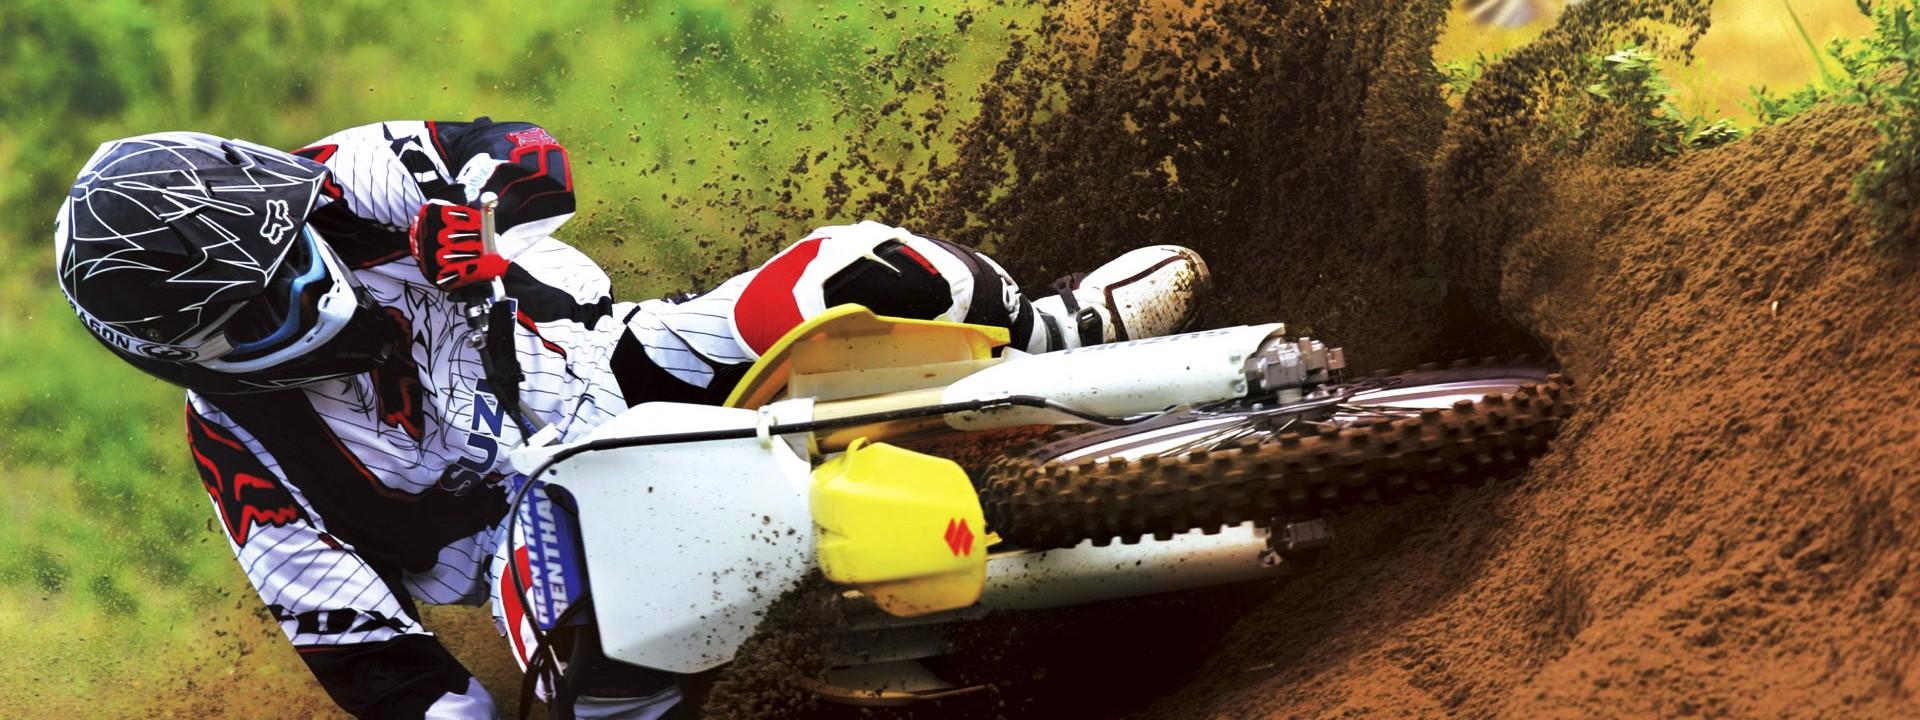 suzuki_motocross_bike_race-wide-e1440445128188